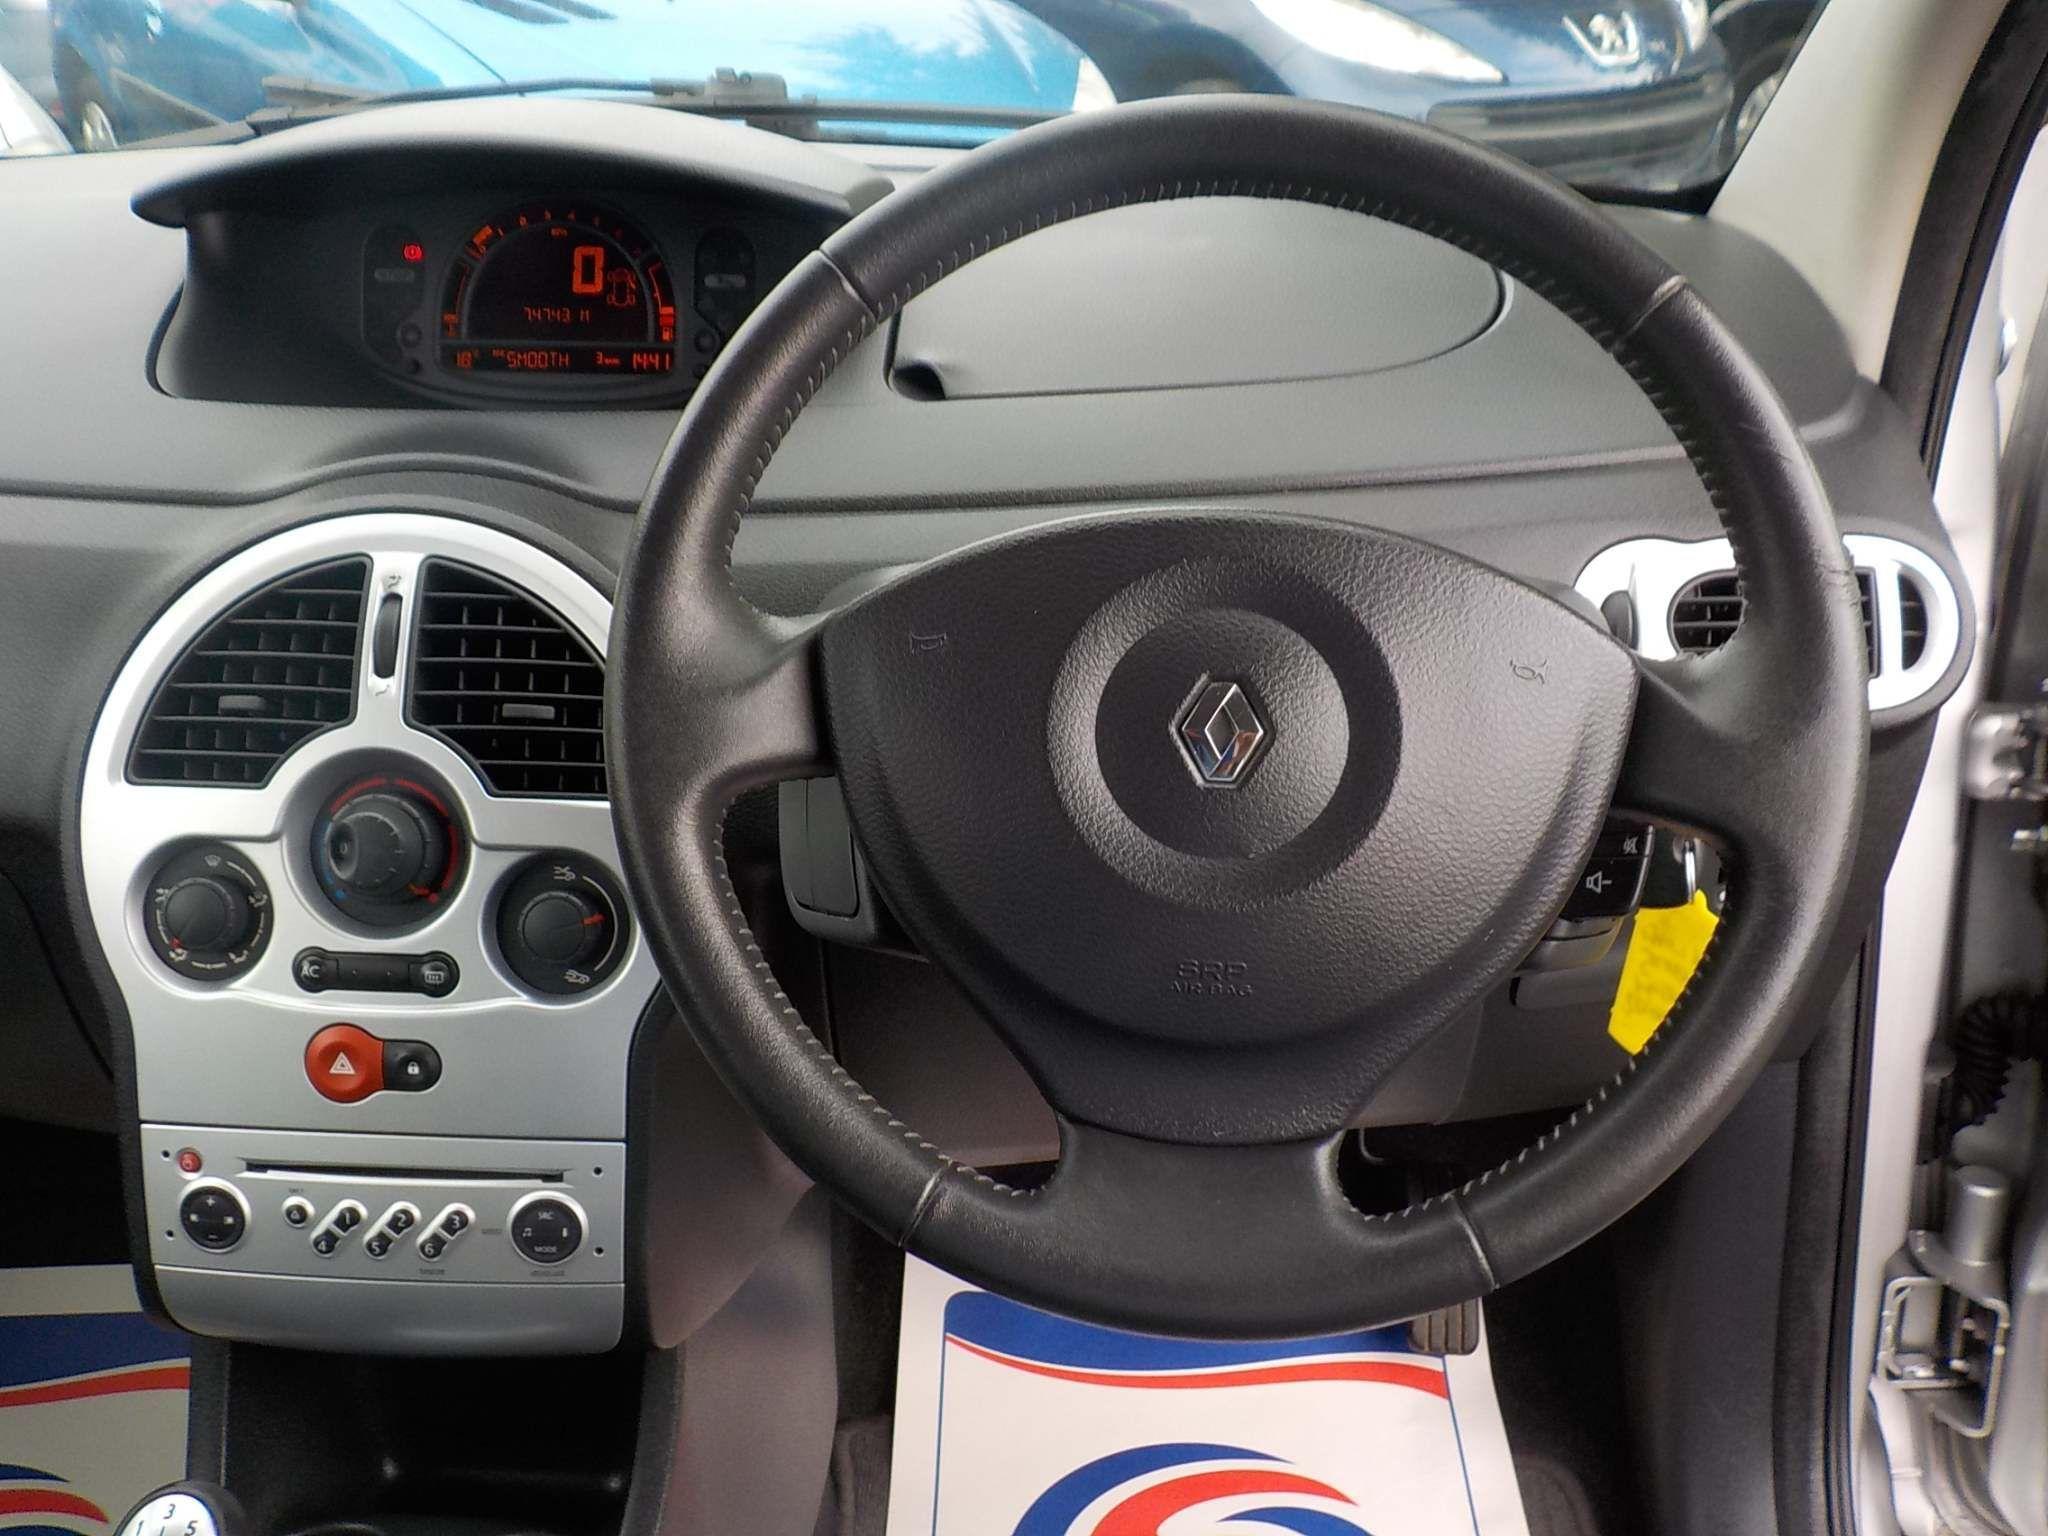 Renault Modus 1.4 16v Dynamique 5dr